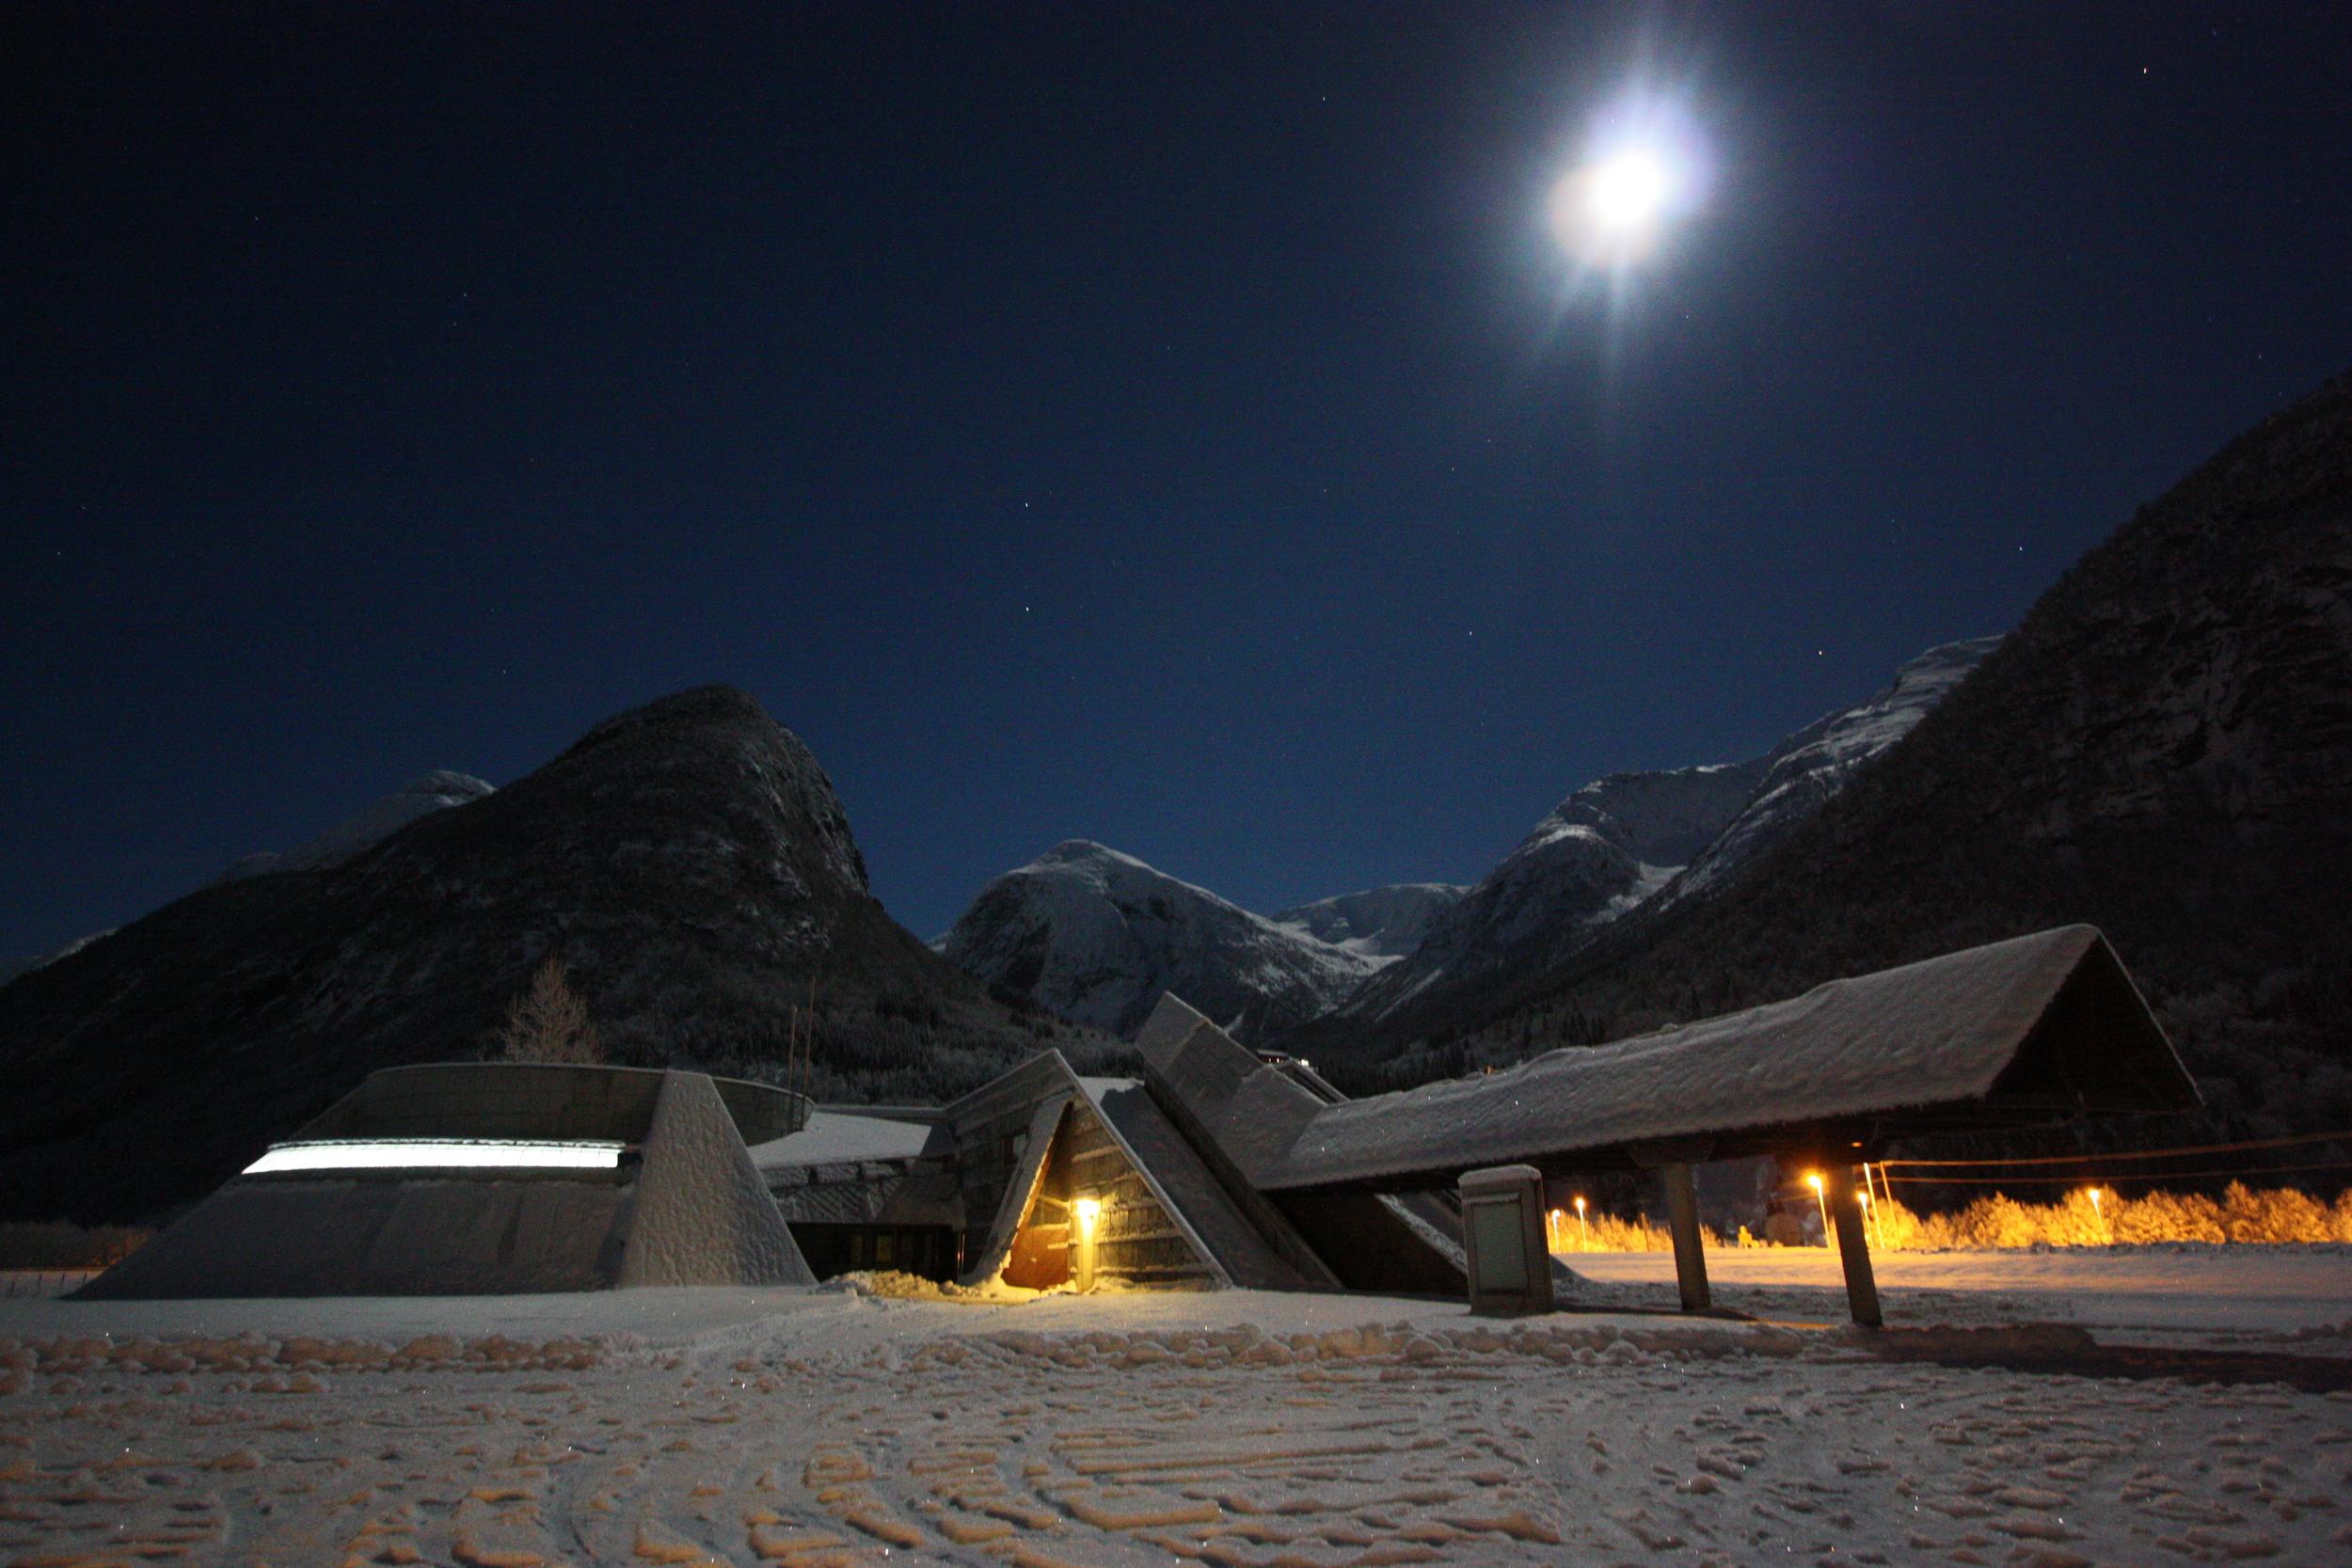 Norsk Bremuseum i månelys vinternatt. Foto: Gaute Dvergsdal Bøyum.